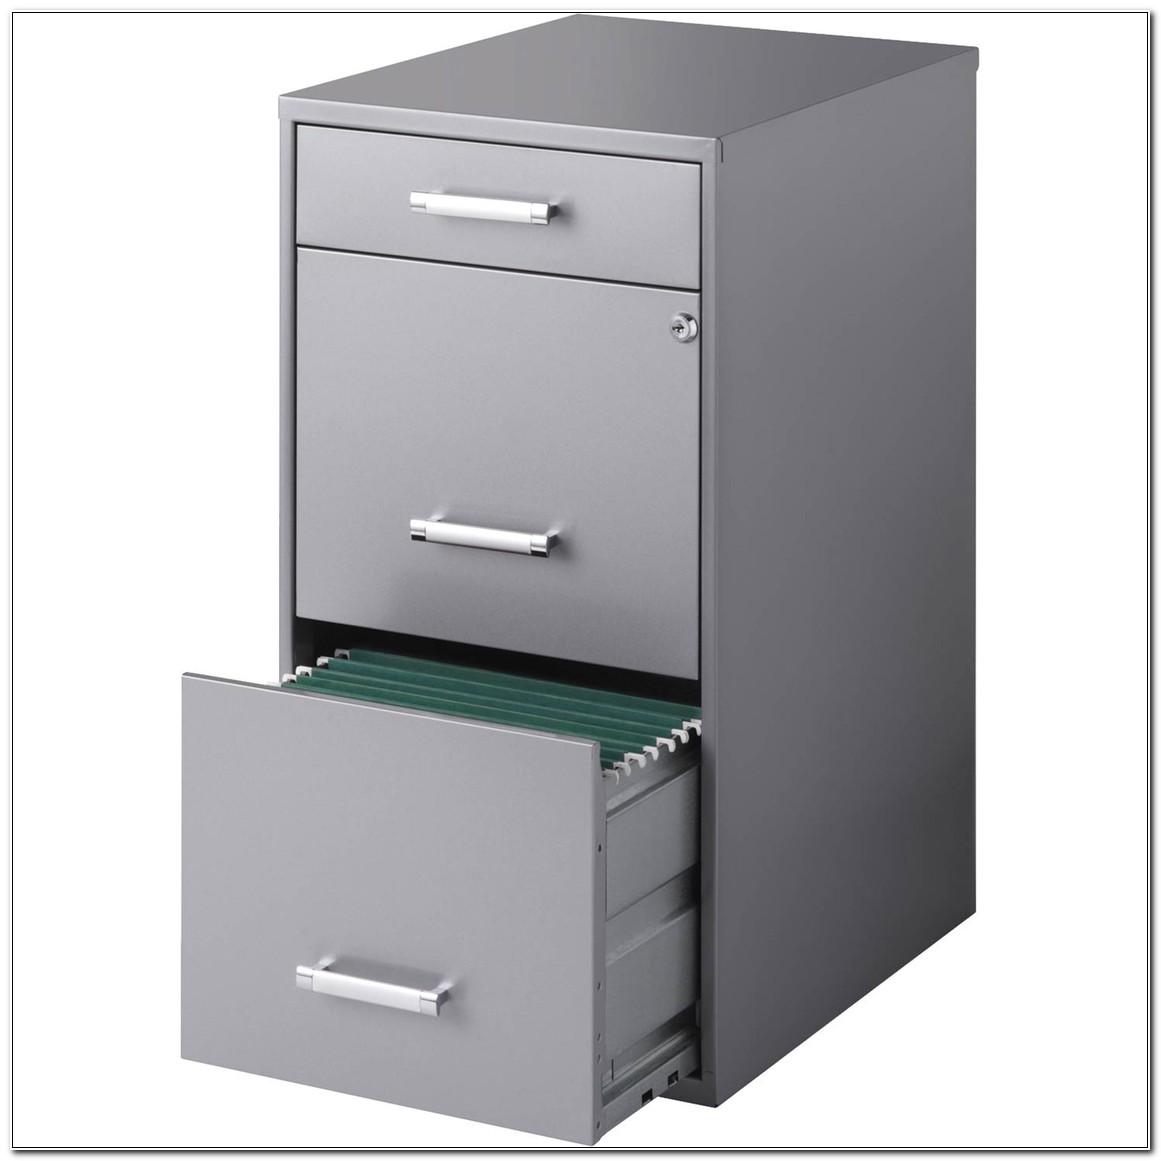 The Organizer 3 Drawer Steel File Cabinet